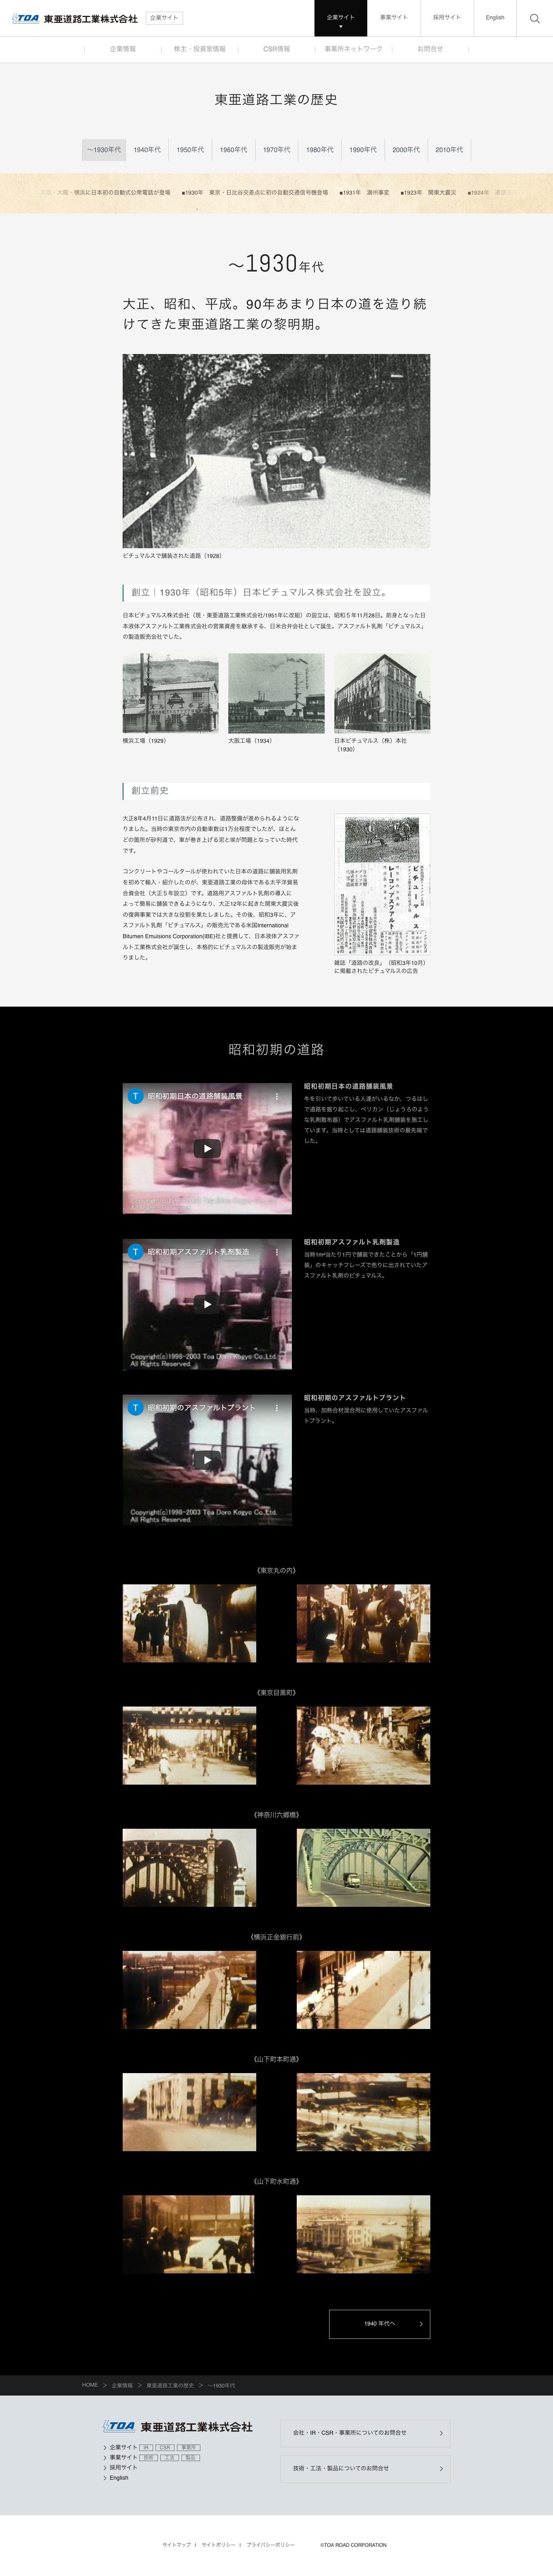 東亜道路工業株式会社様|コーポレートサイト『東亜道路工業の歴史』